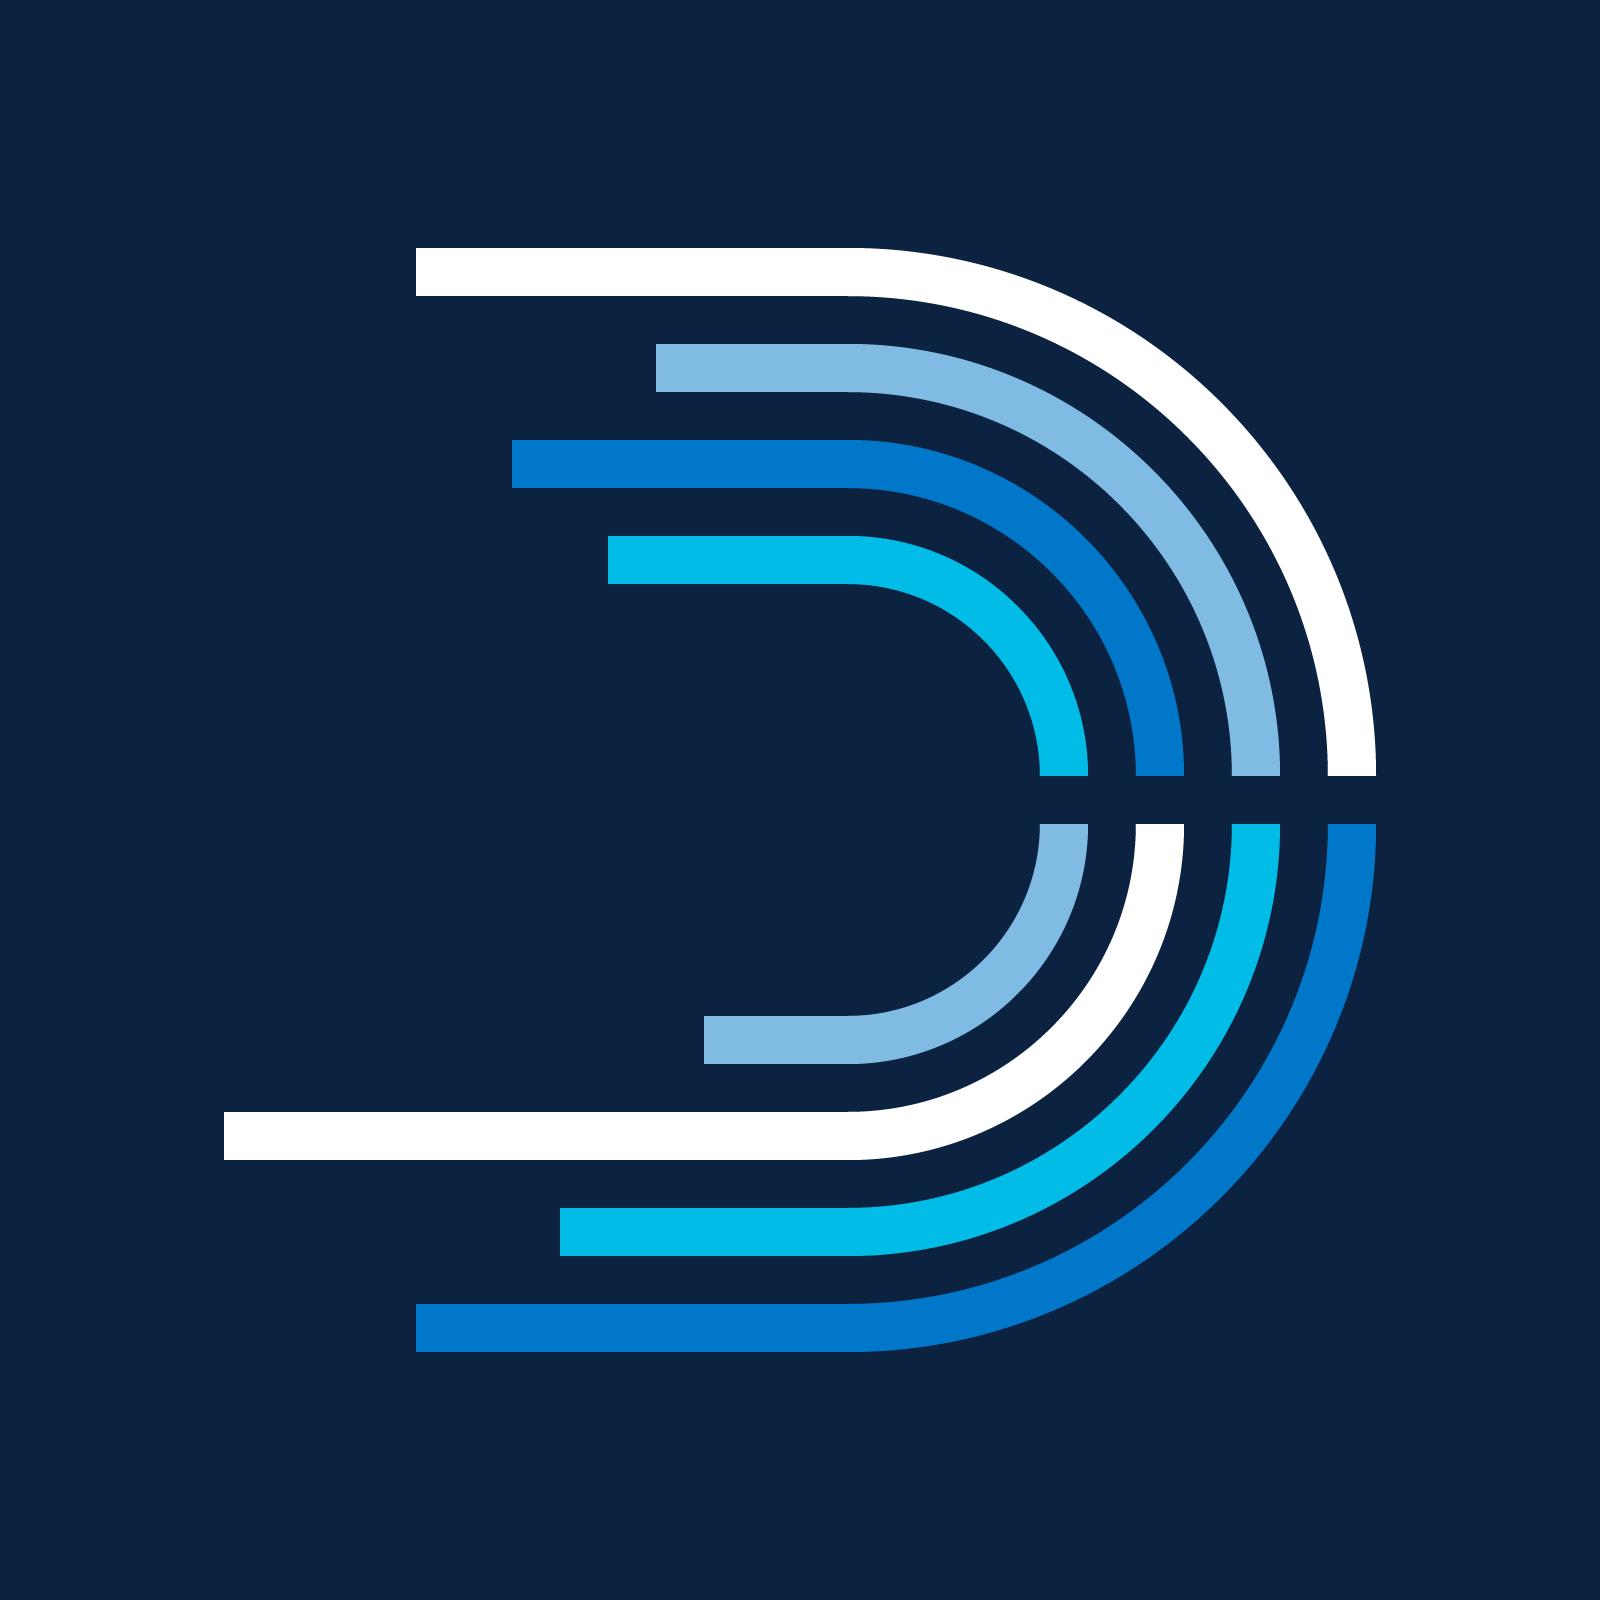 jkdc_dccc-profile.png